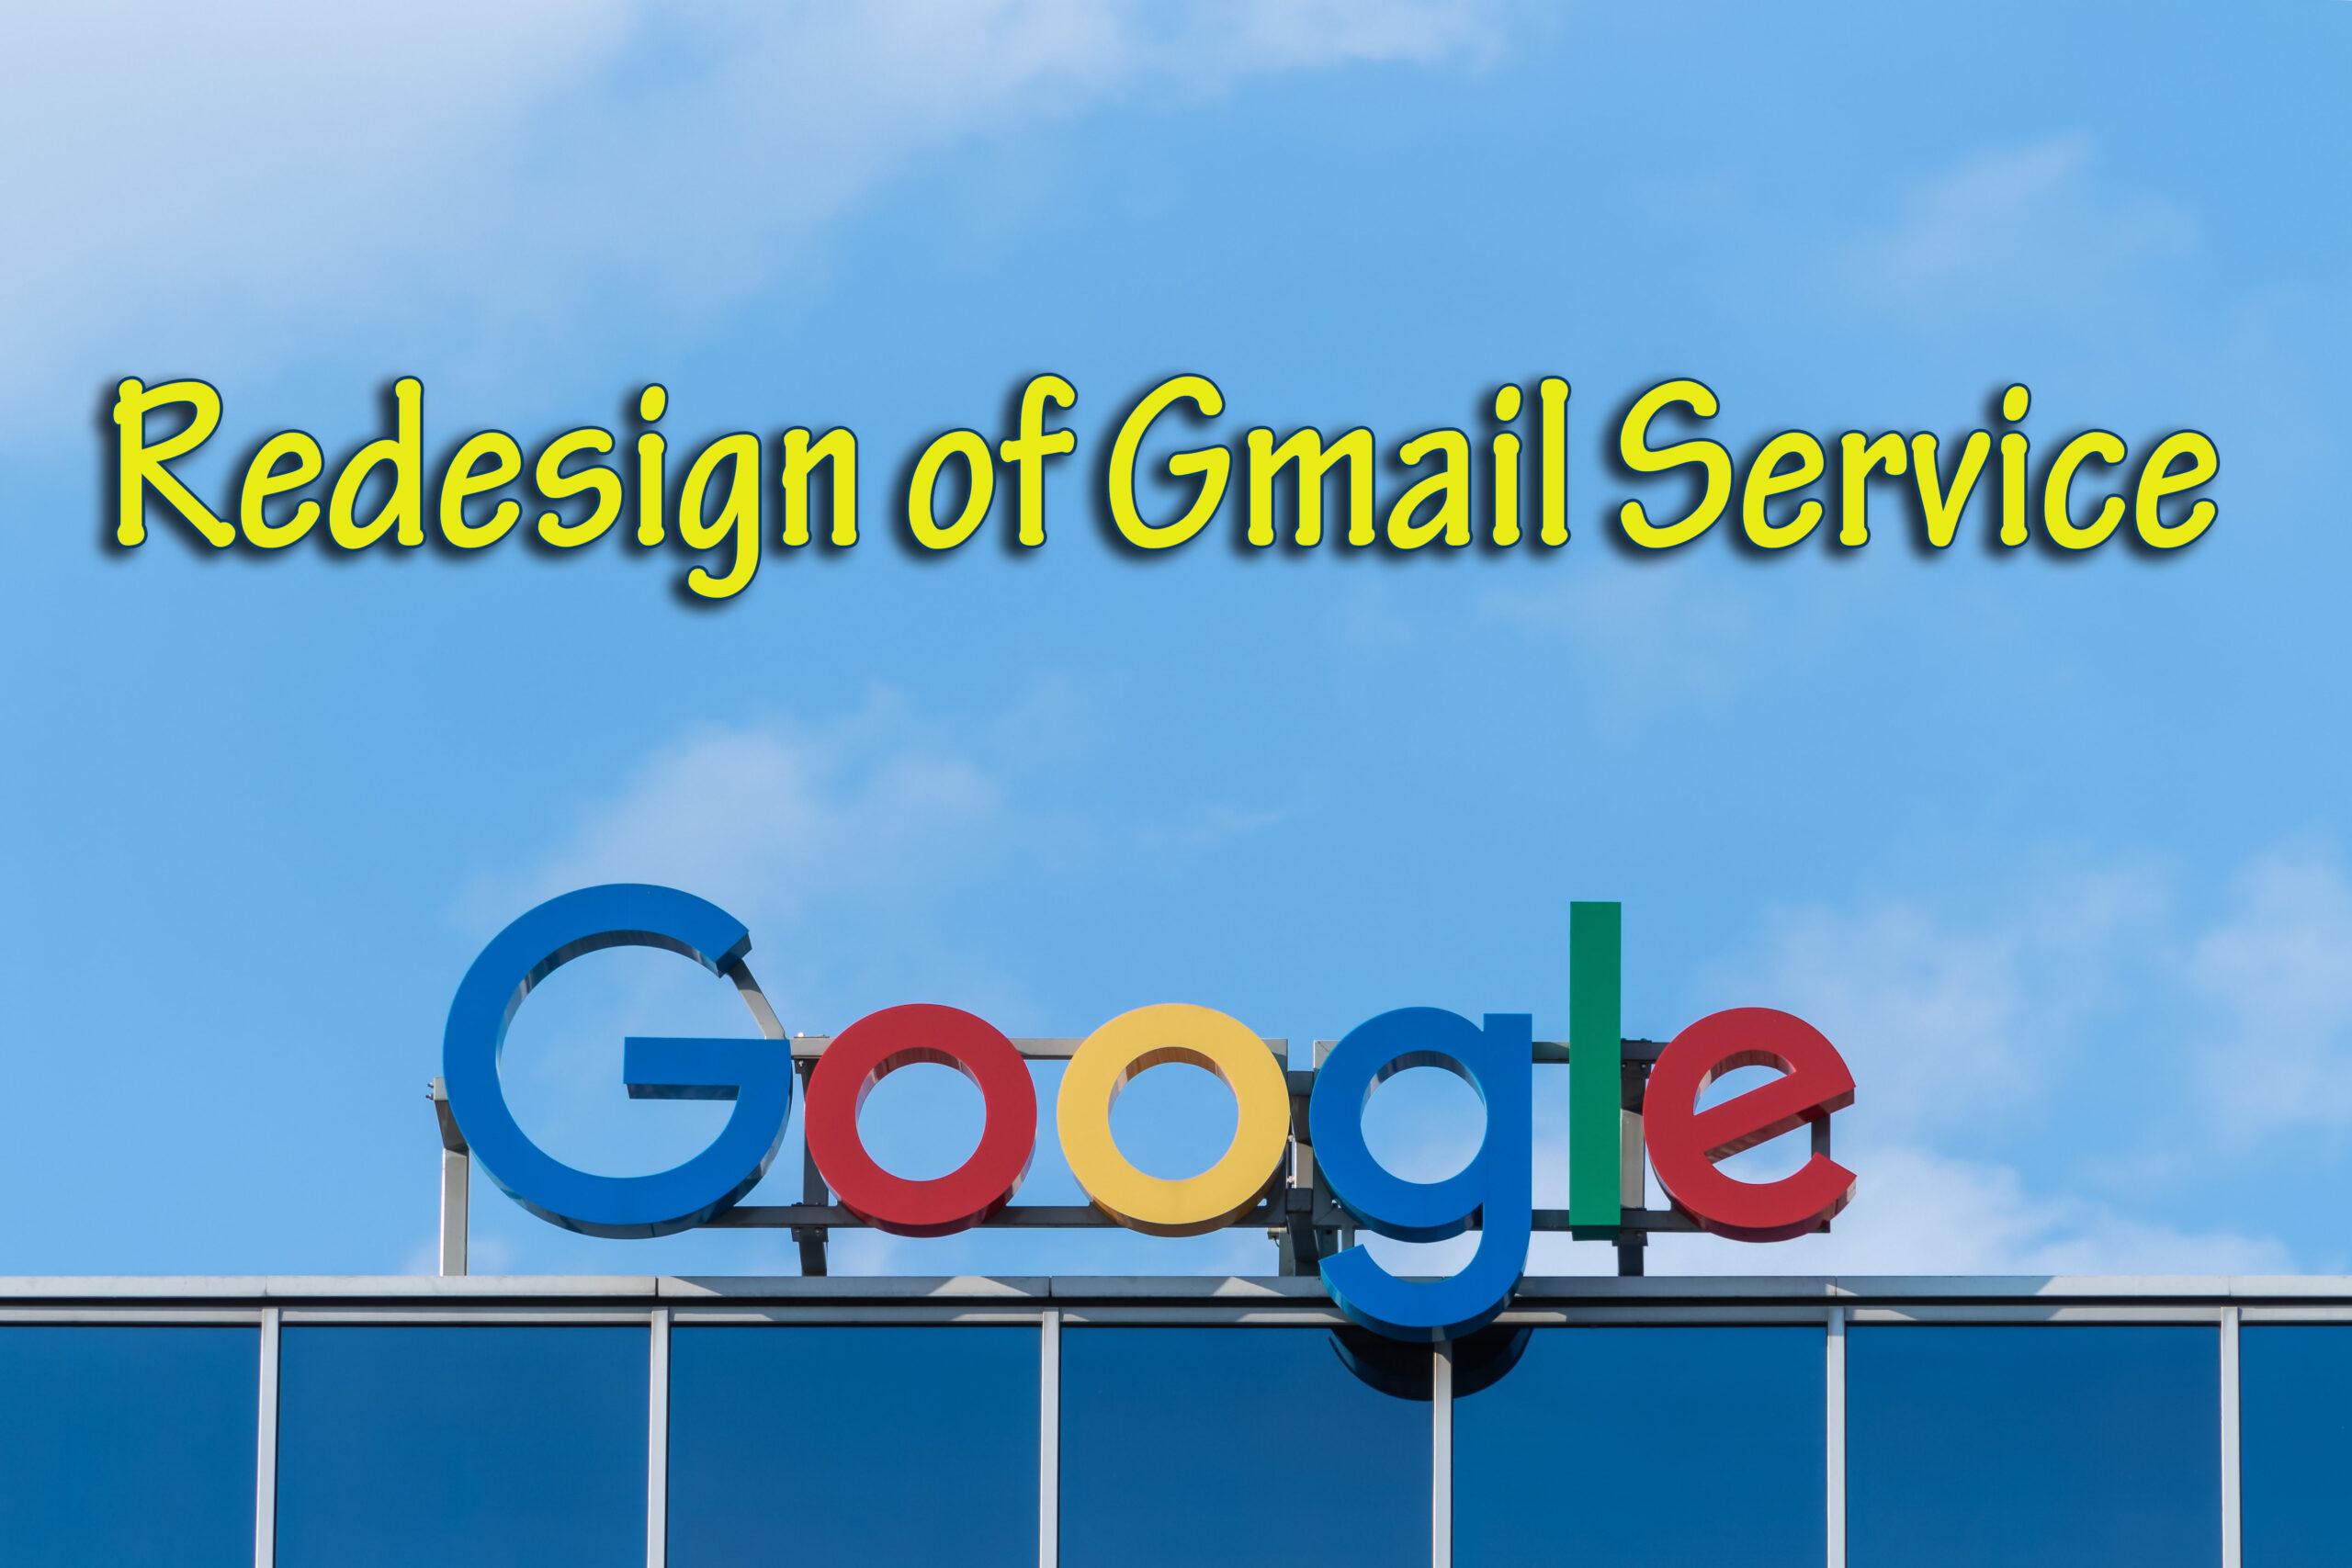 Google Anounces Gmail Redesign Service